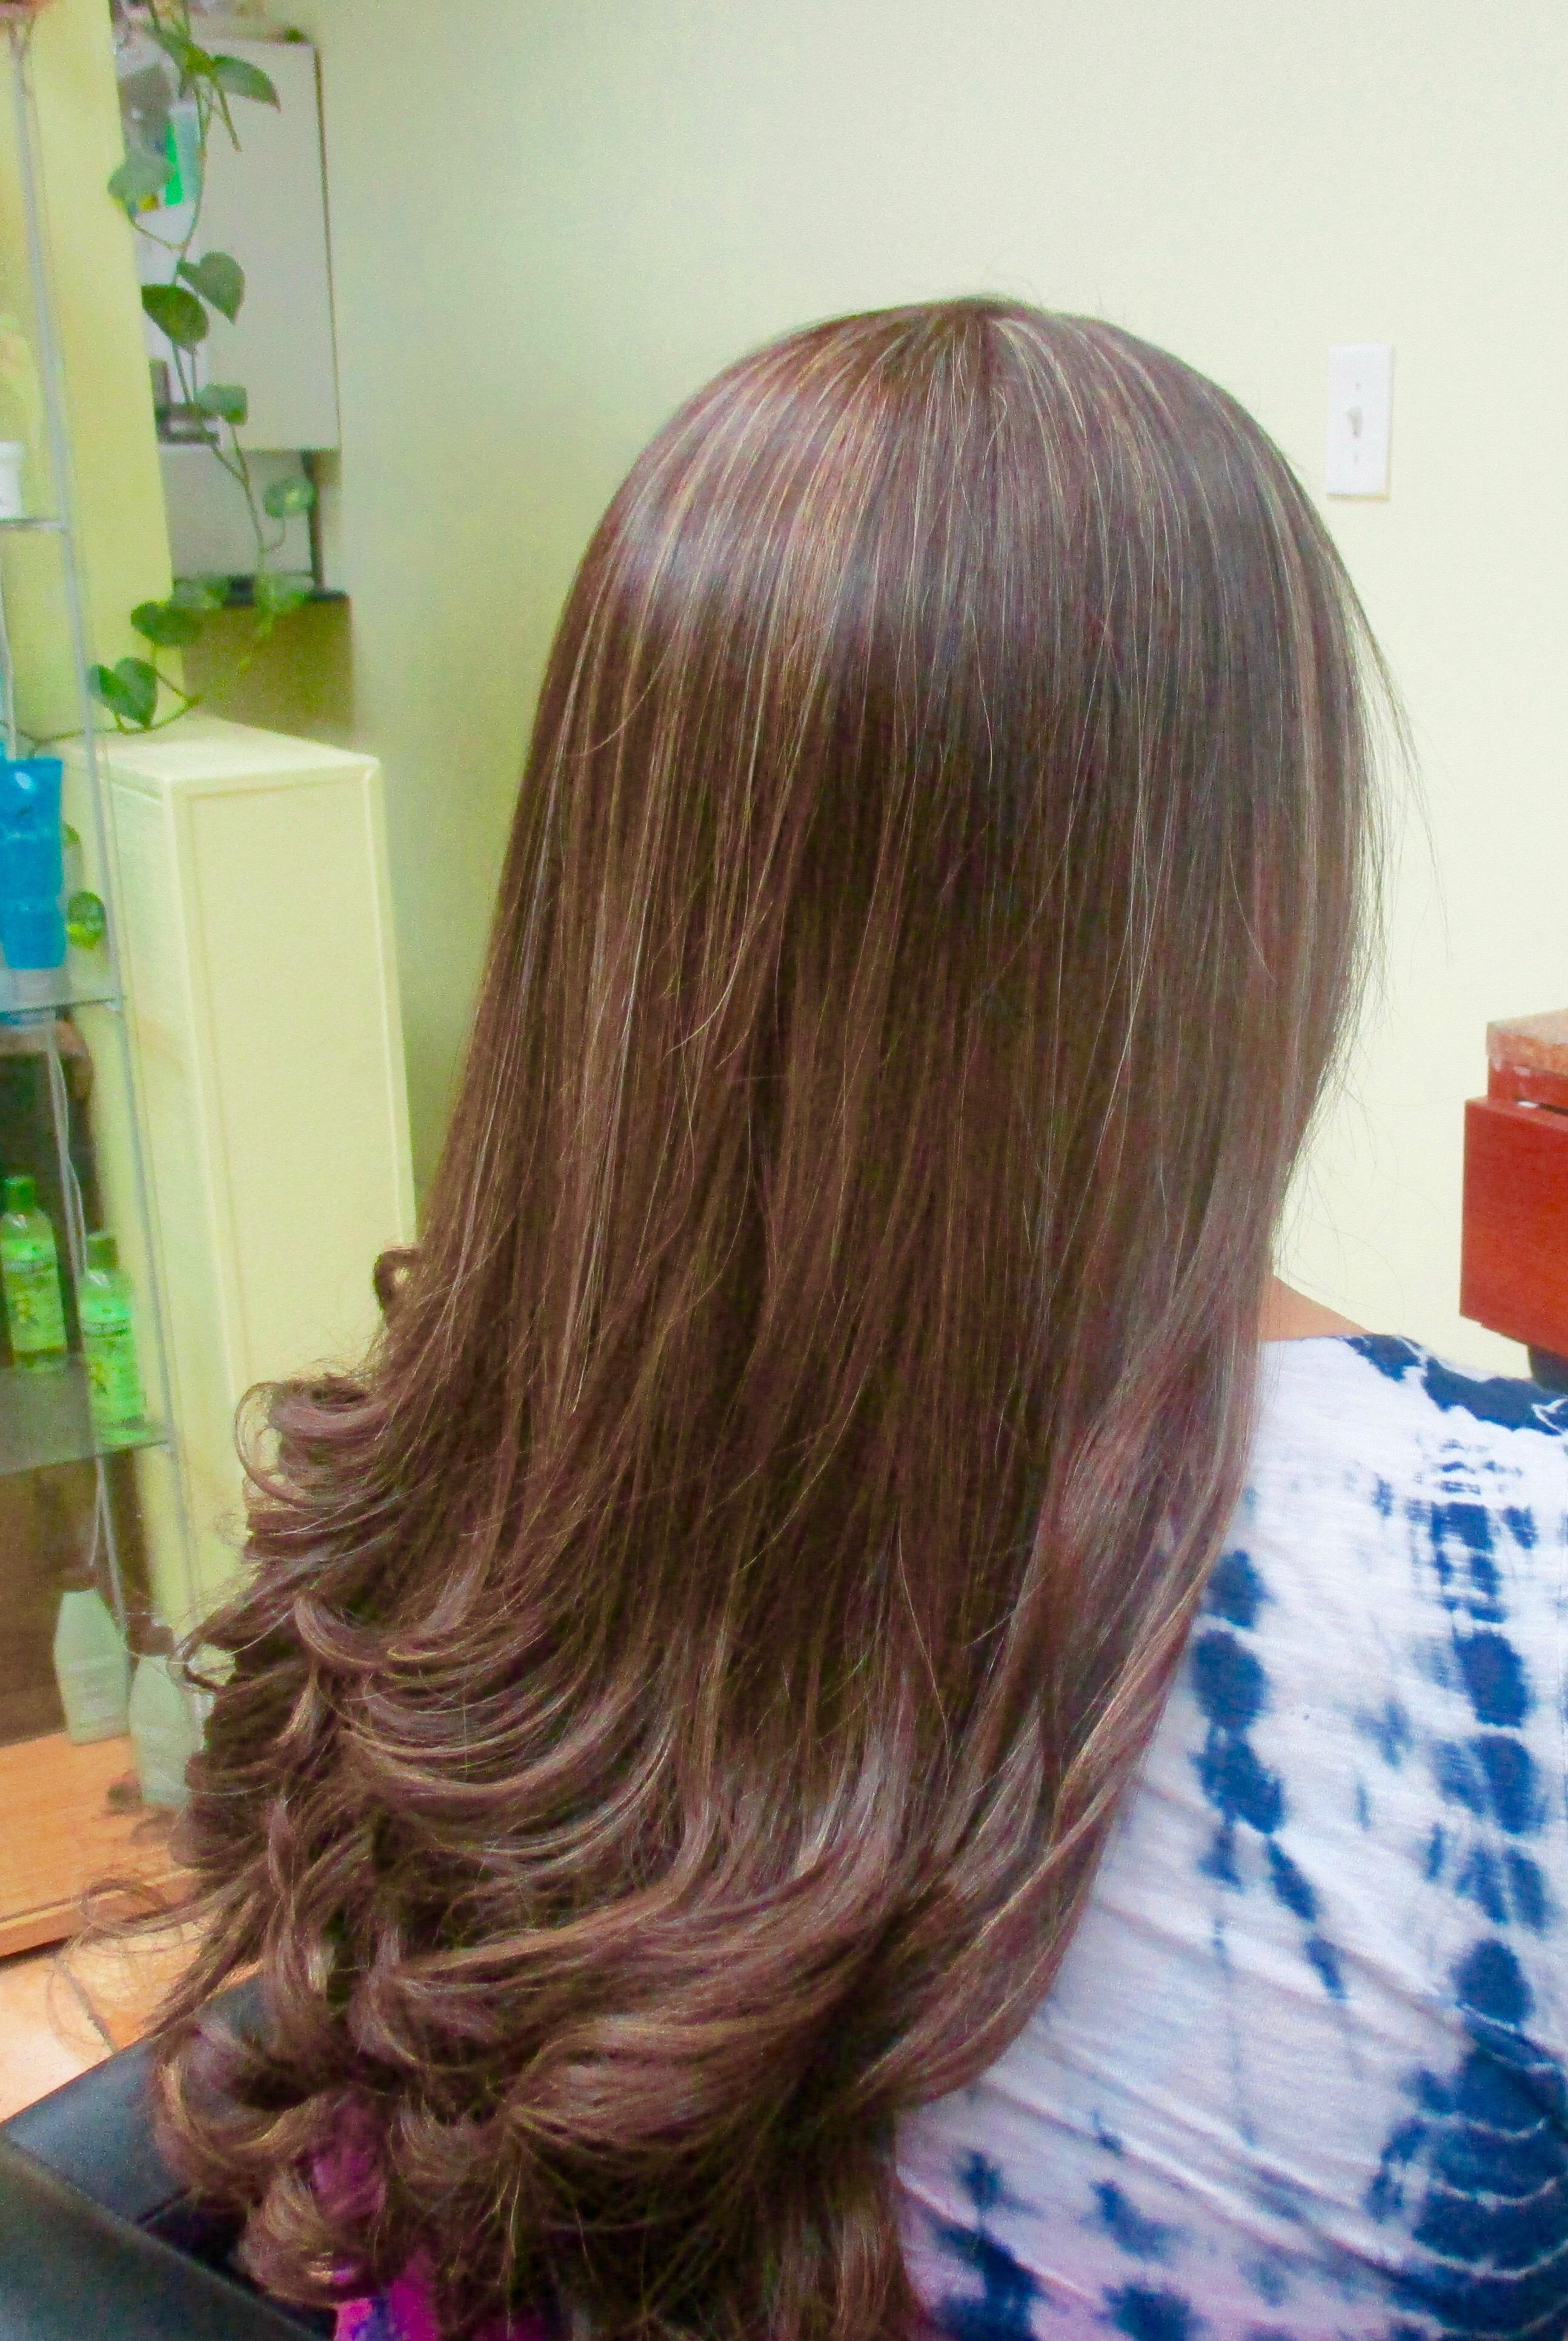 Alex Unisex Hair Salon Cut And Style For Women